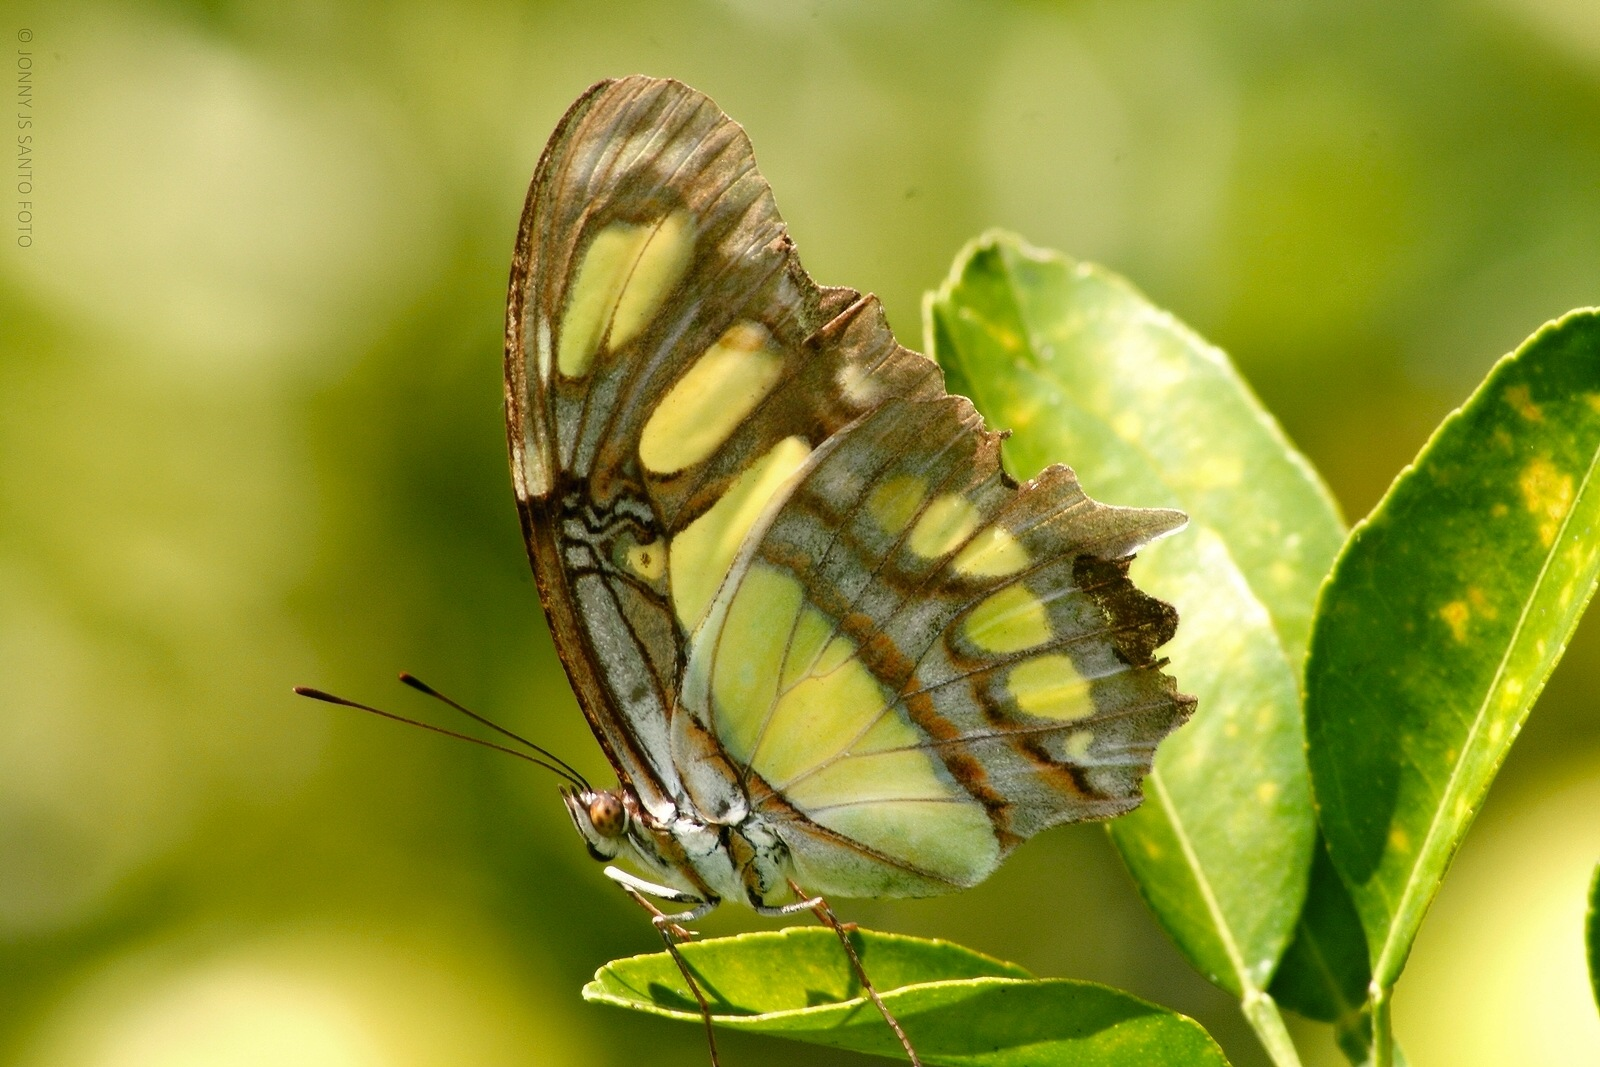 The Butterfly by Jonny Santo